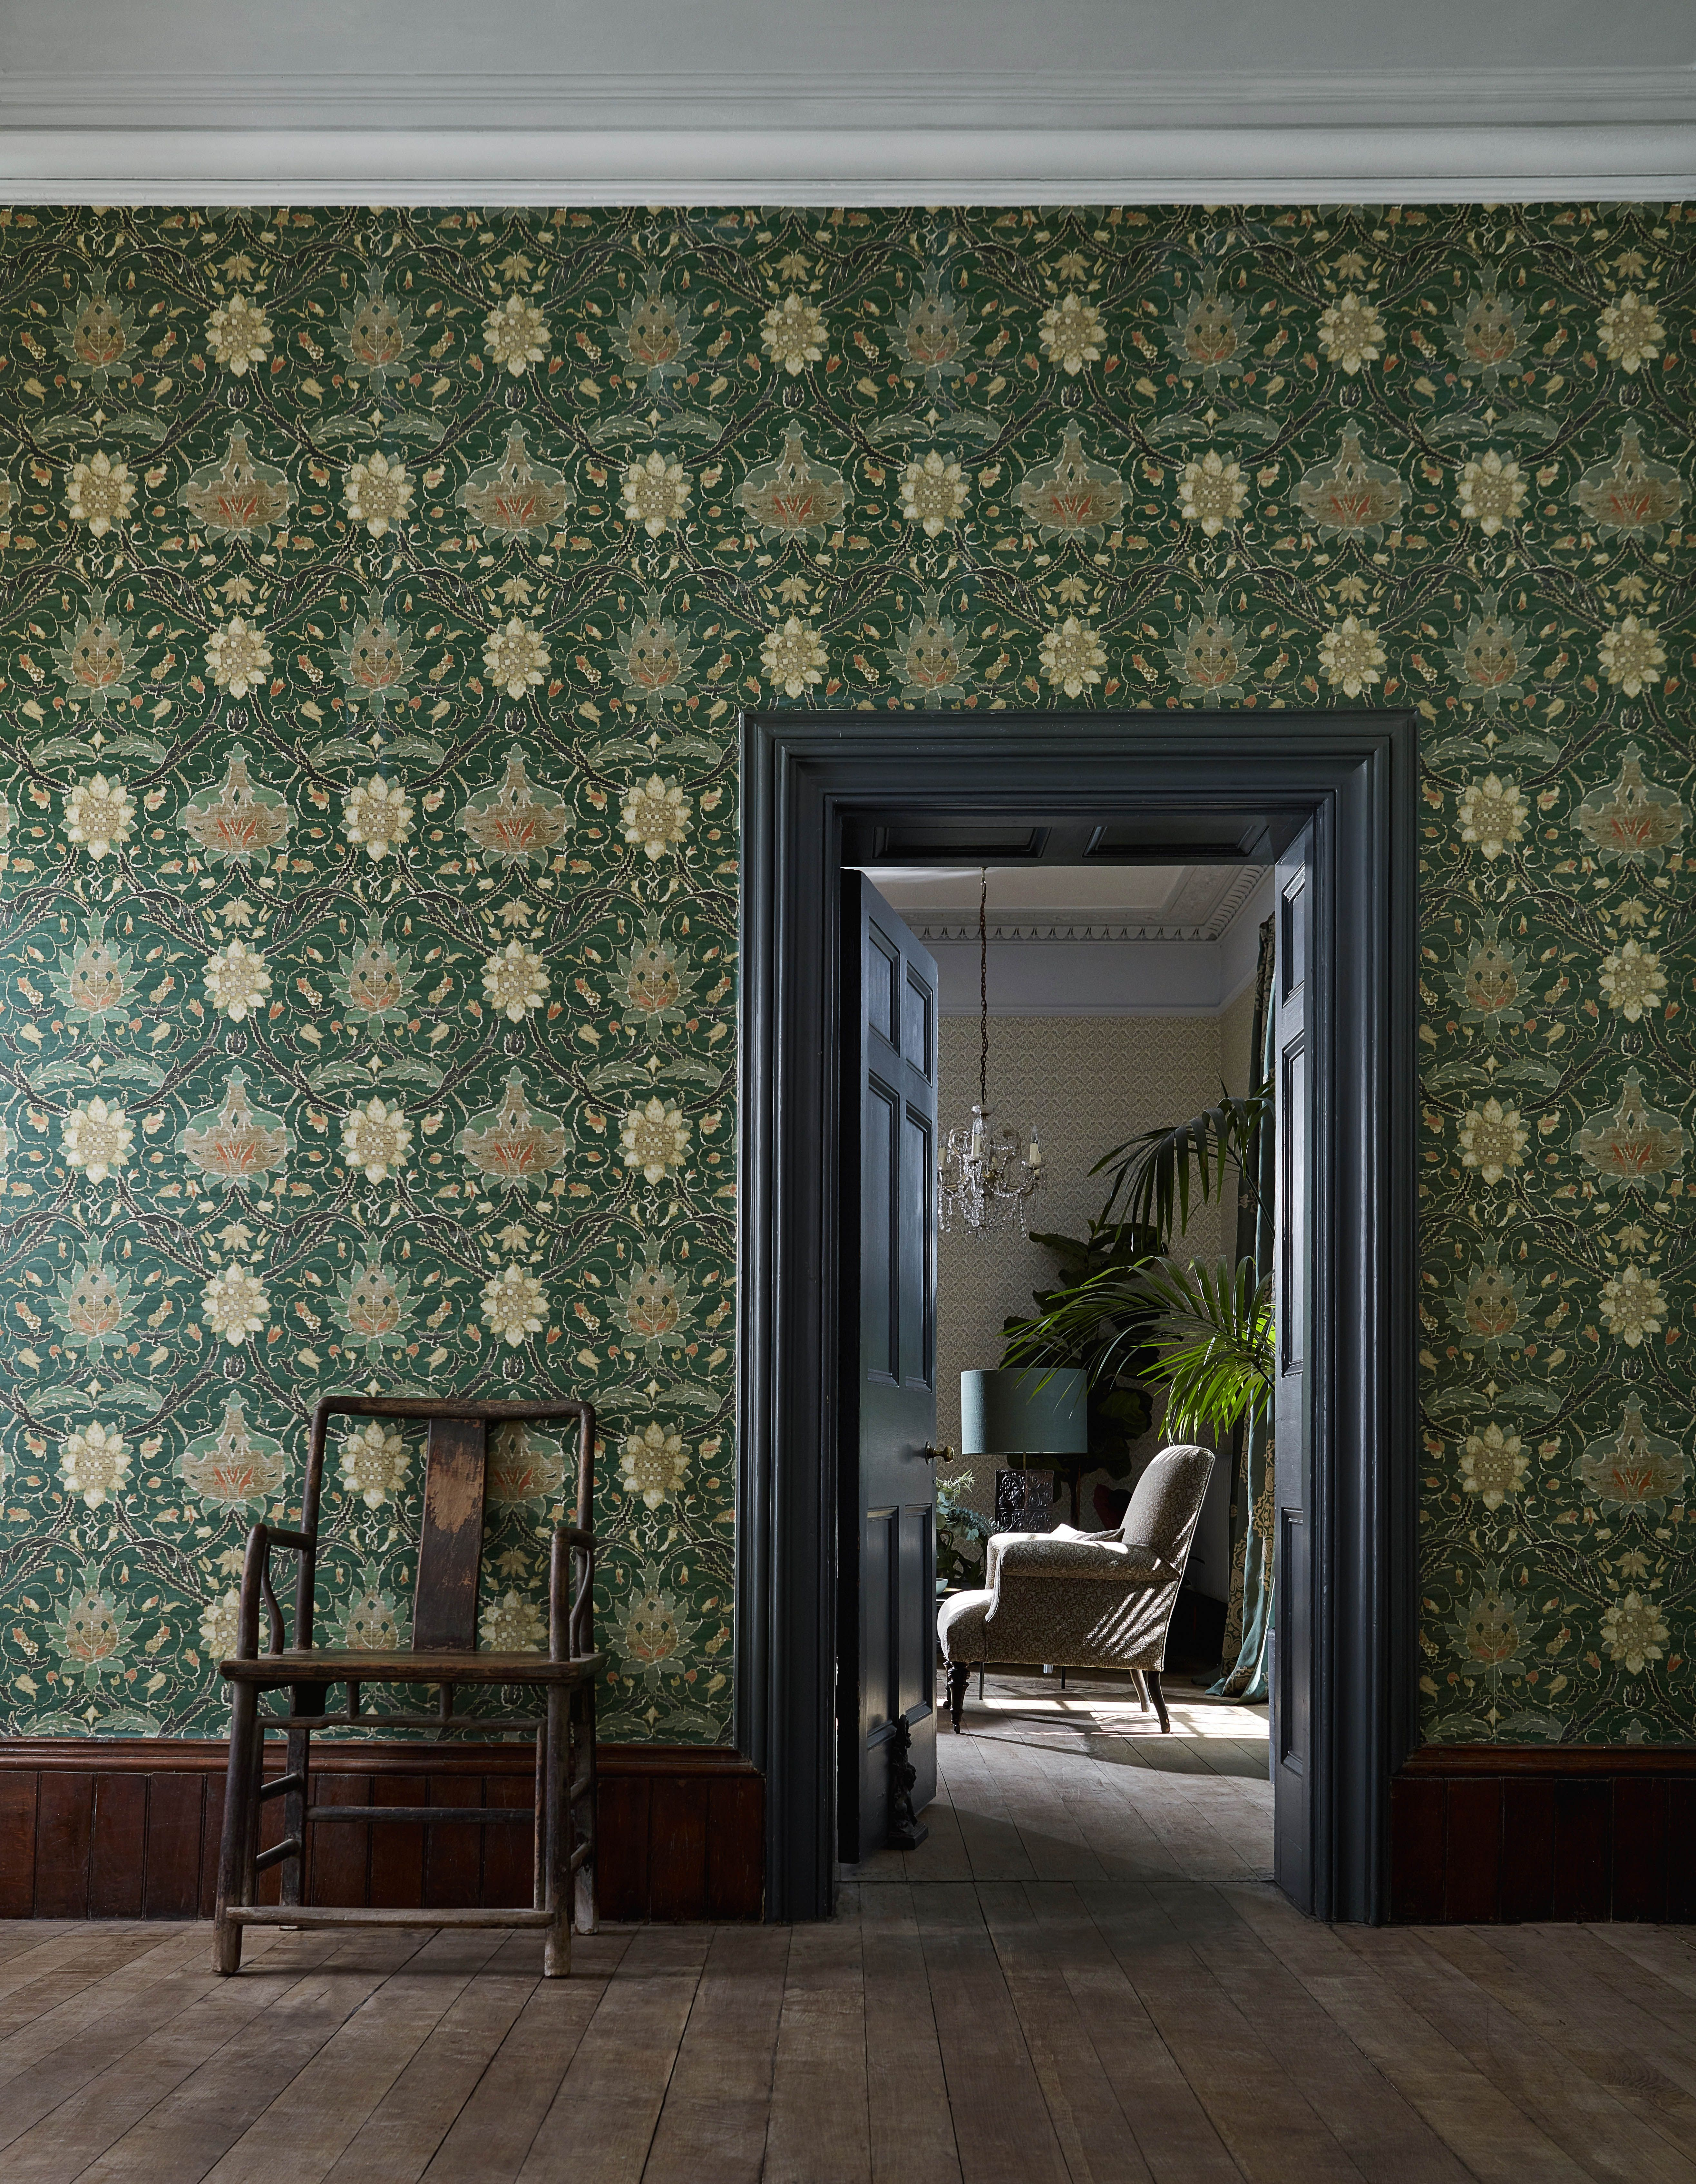 15 inspiring traditional living room ideas | Morris ...